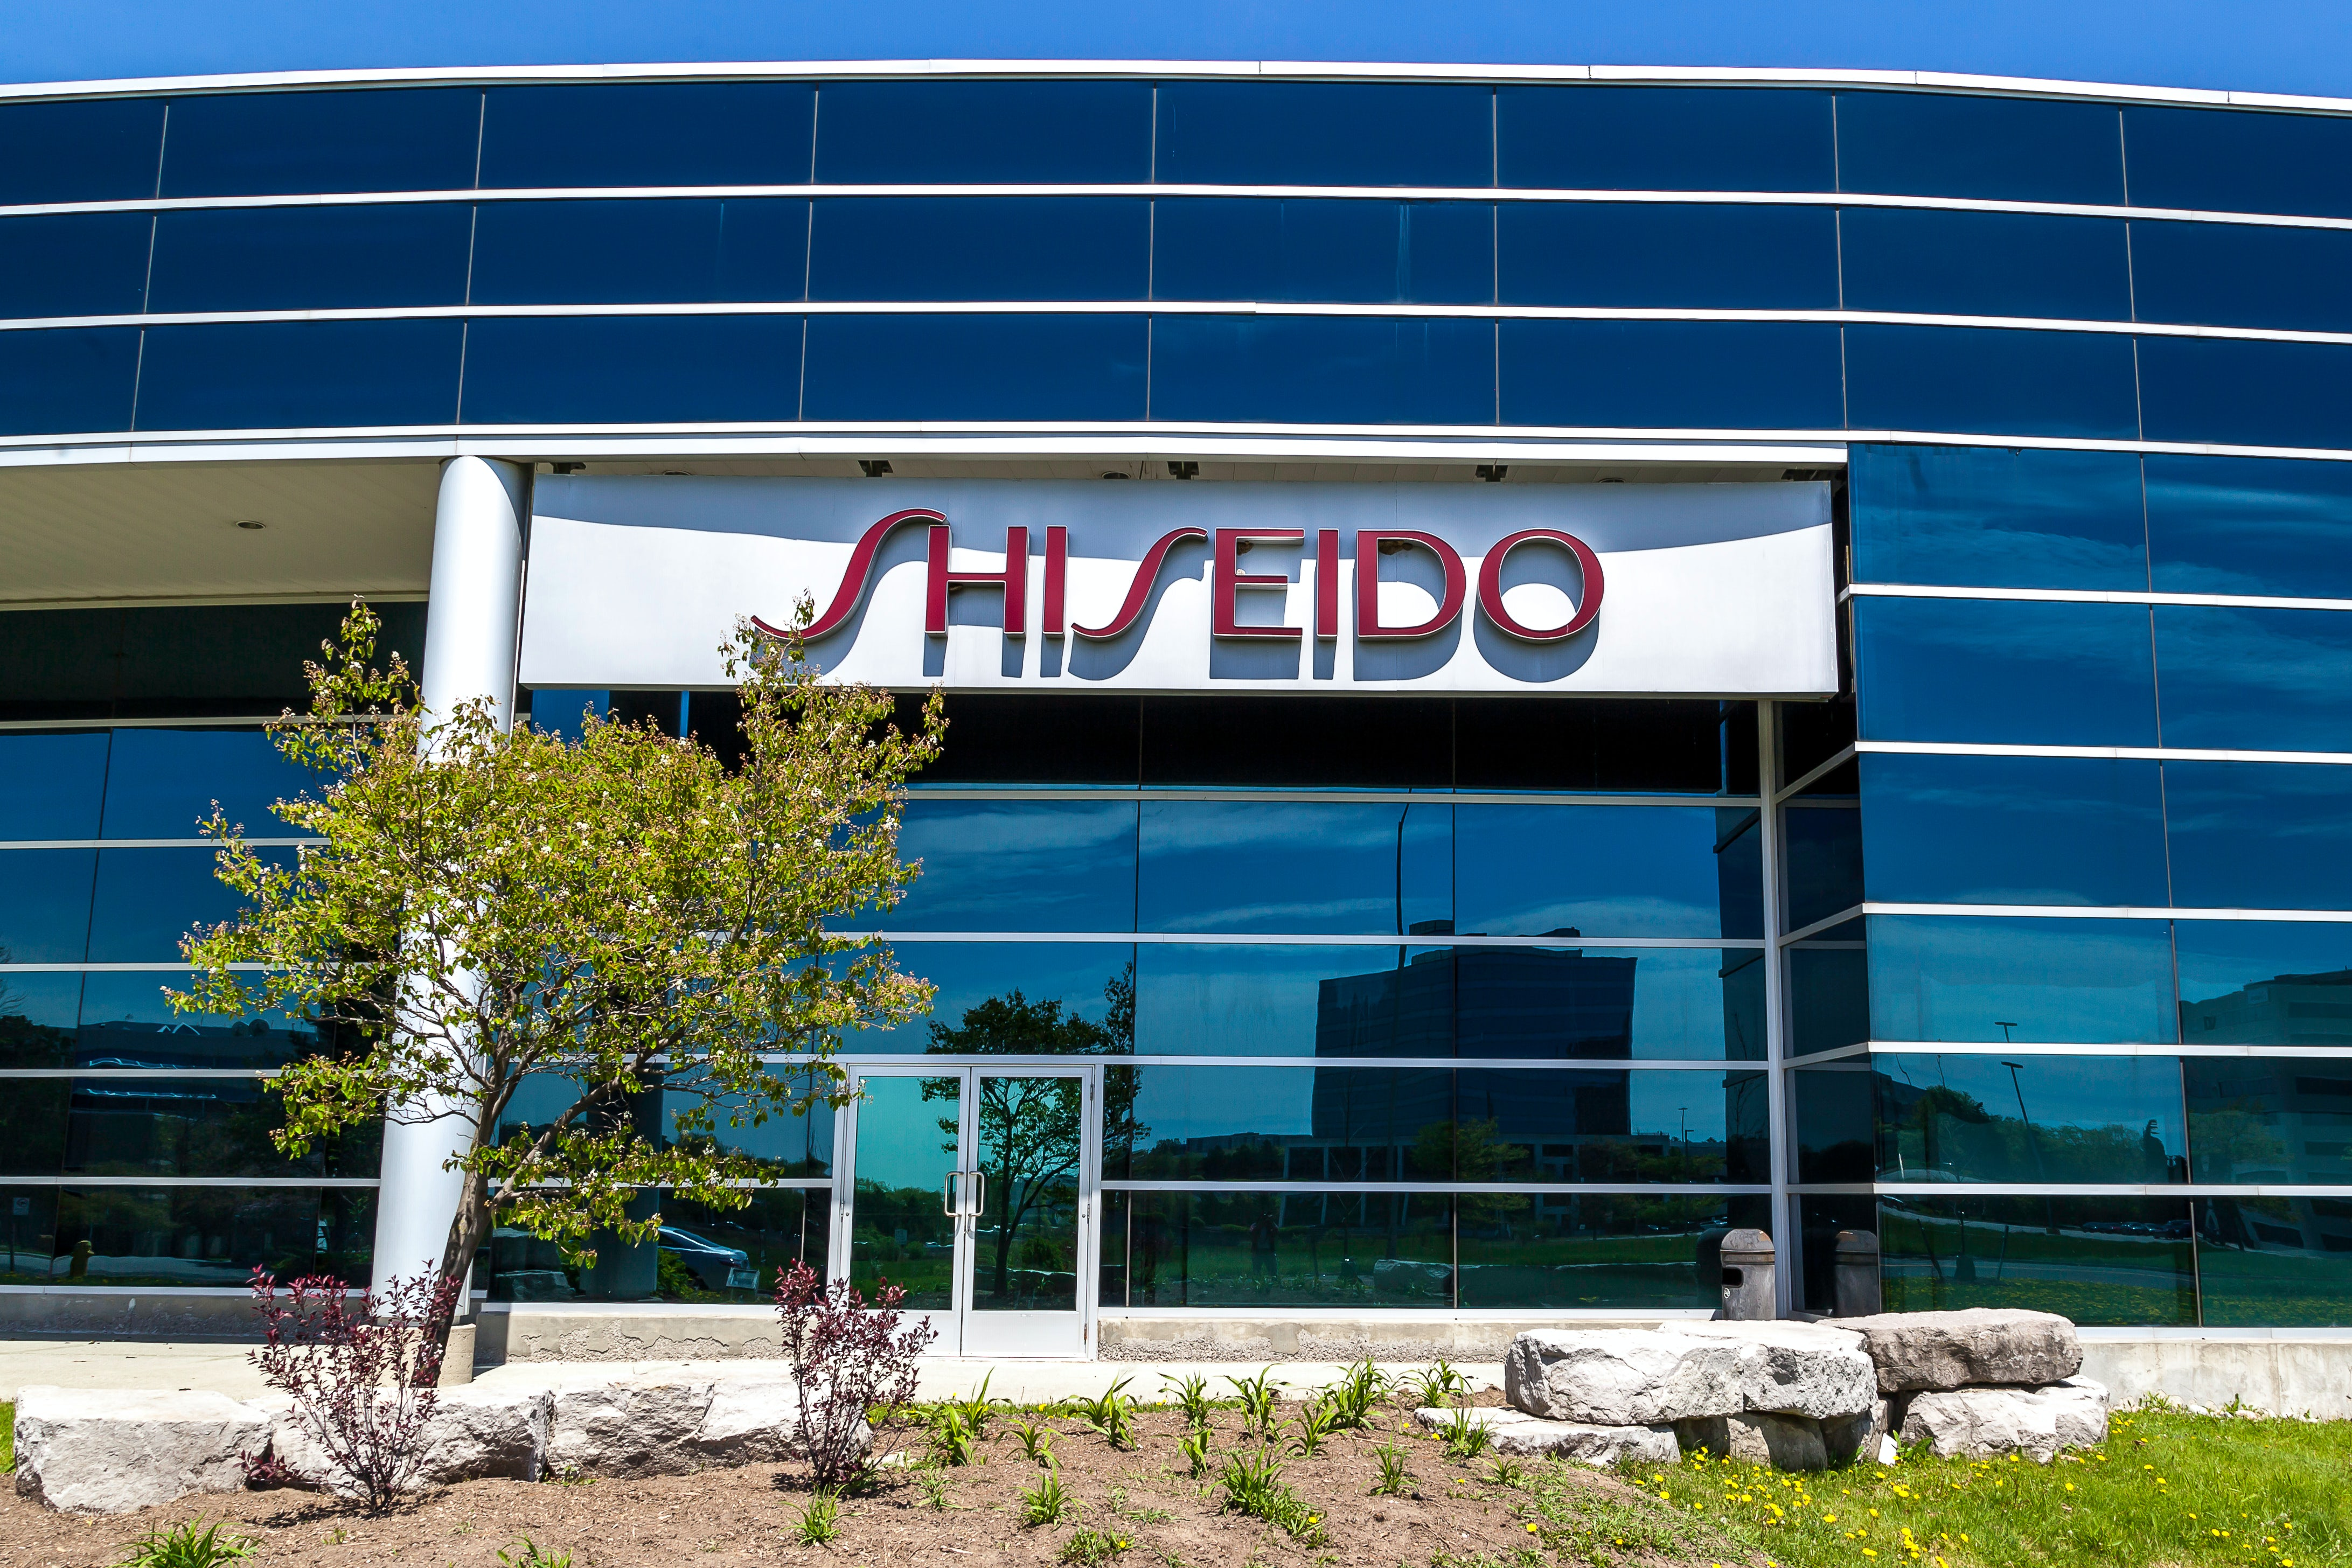 Shiseido office in Markham, Ontario. Shutterstock.